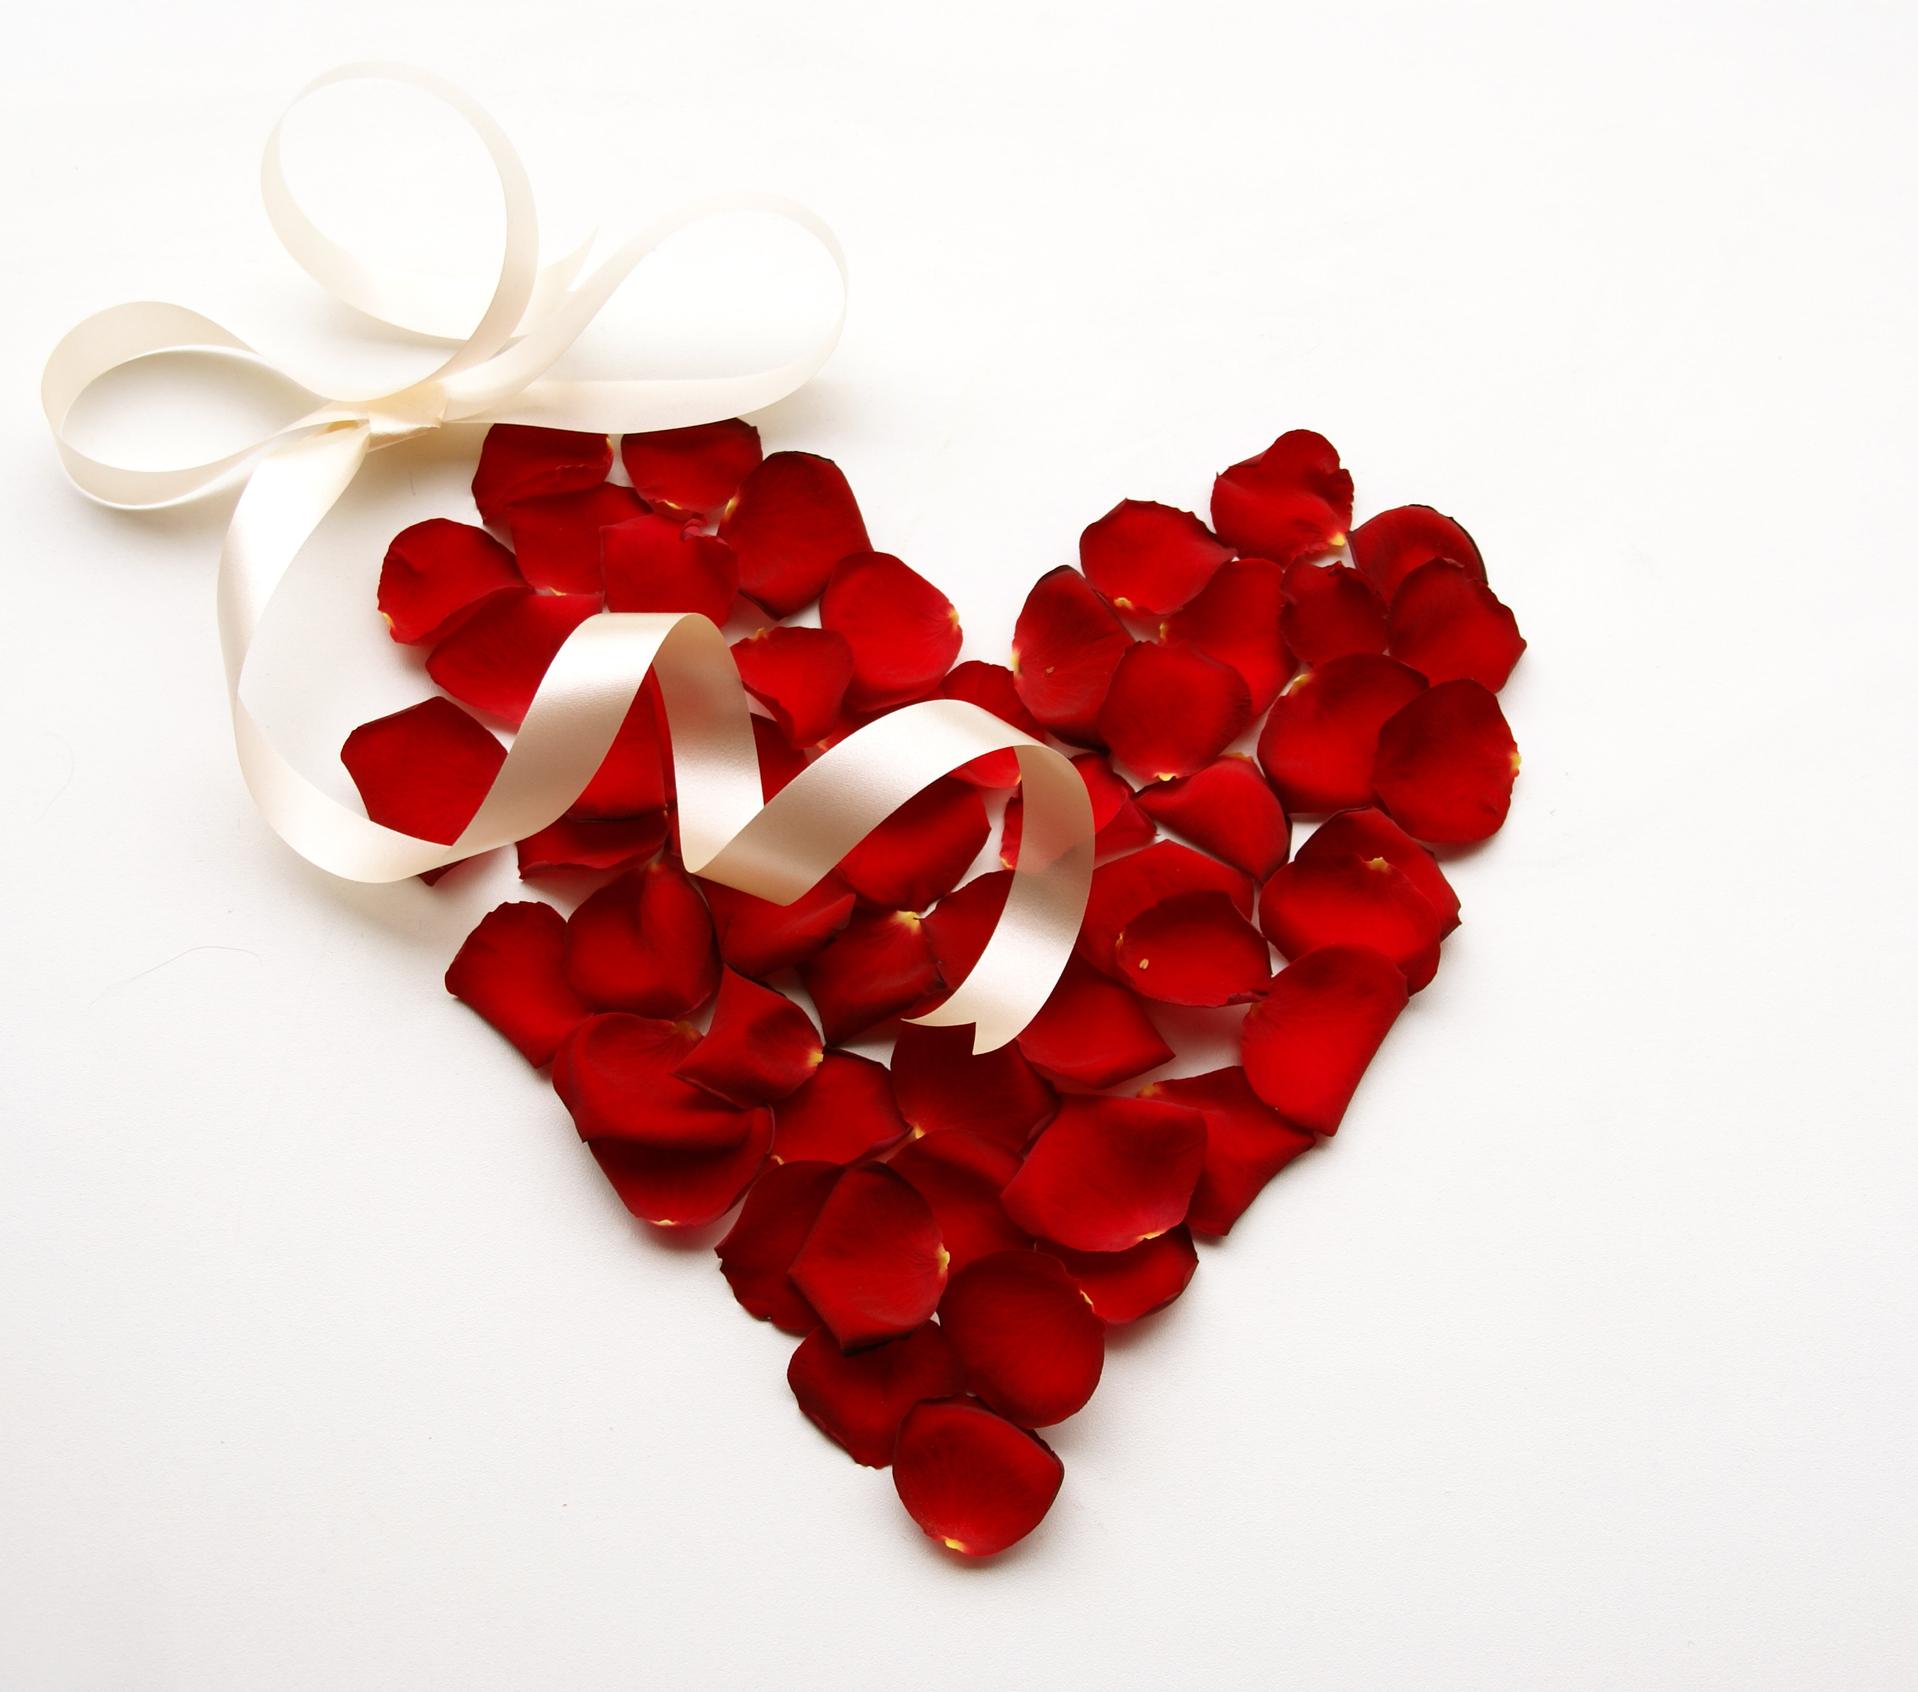 Celebrating Valentine's Day around the world